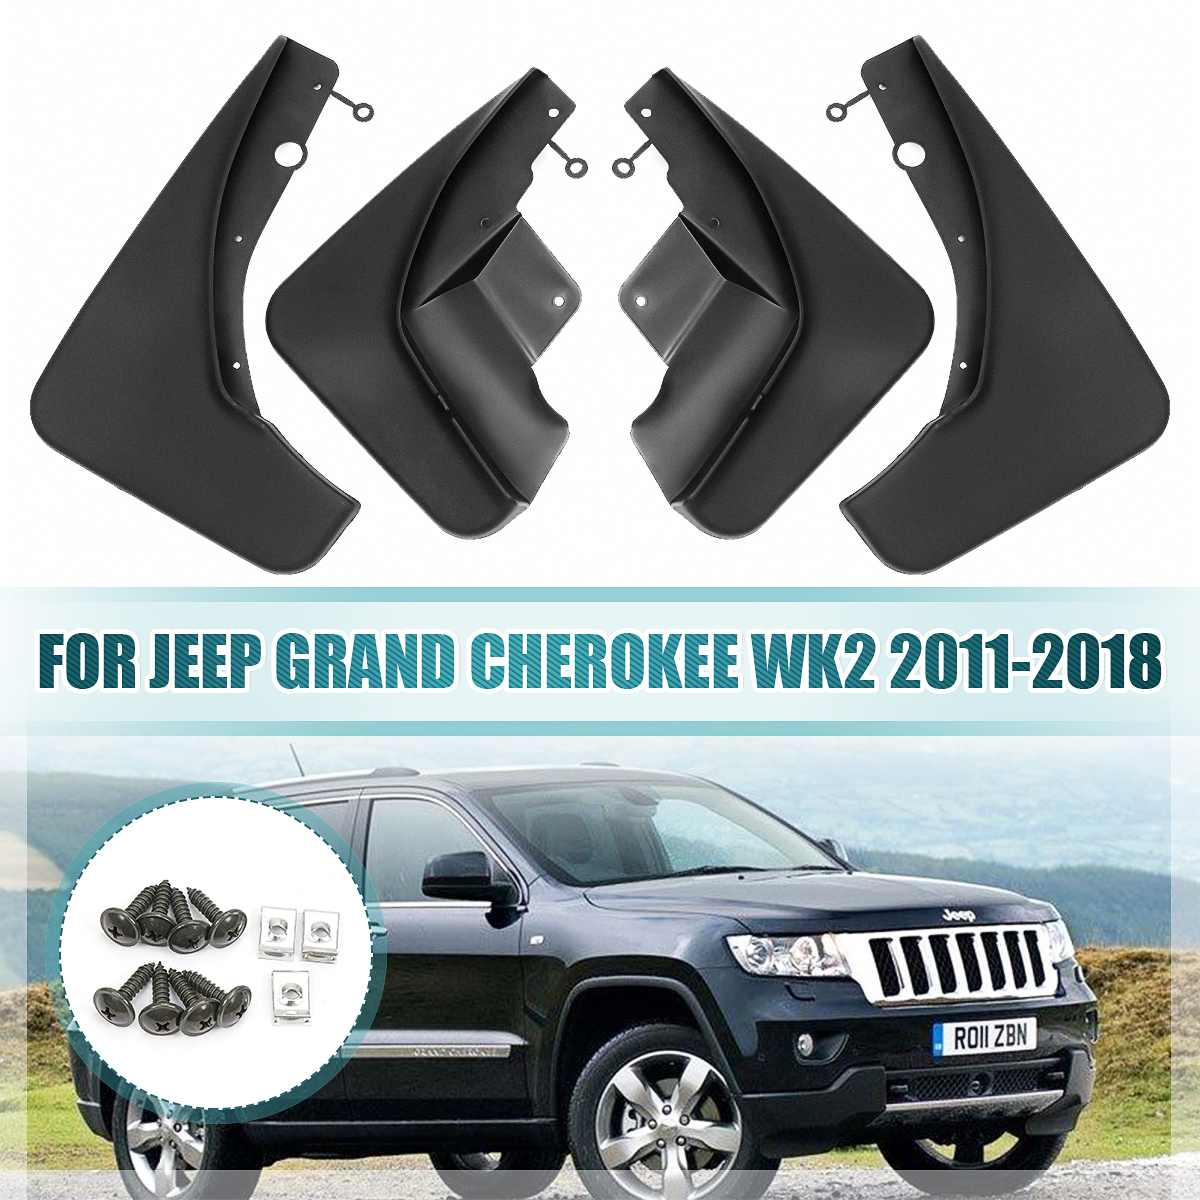 Garde-boue garde-boue pour garde-boue garde-boue garde-boue pour Jeep Grand Cherokee WK2 2011 2012 2013 2014 2015 2016 2017 2018